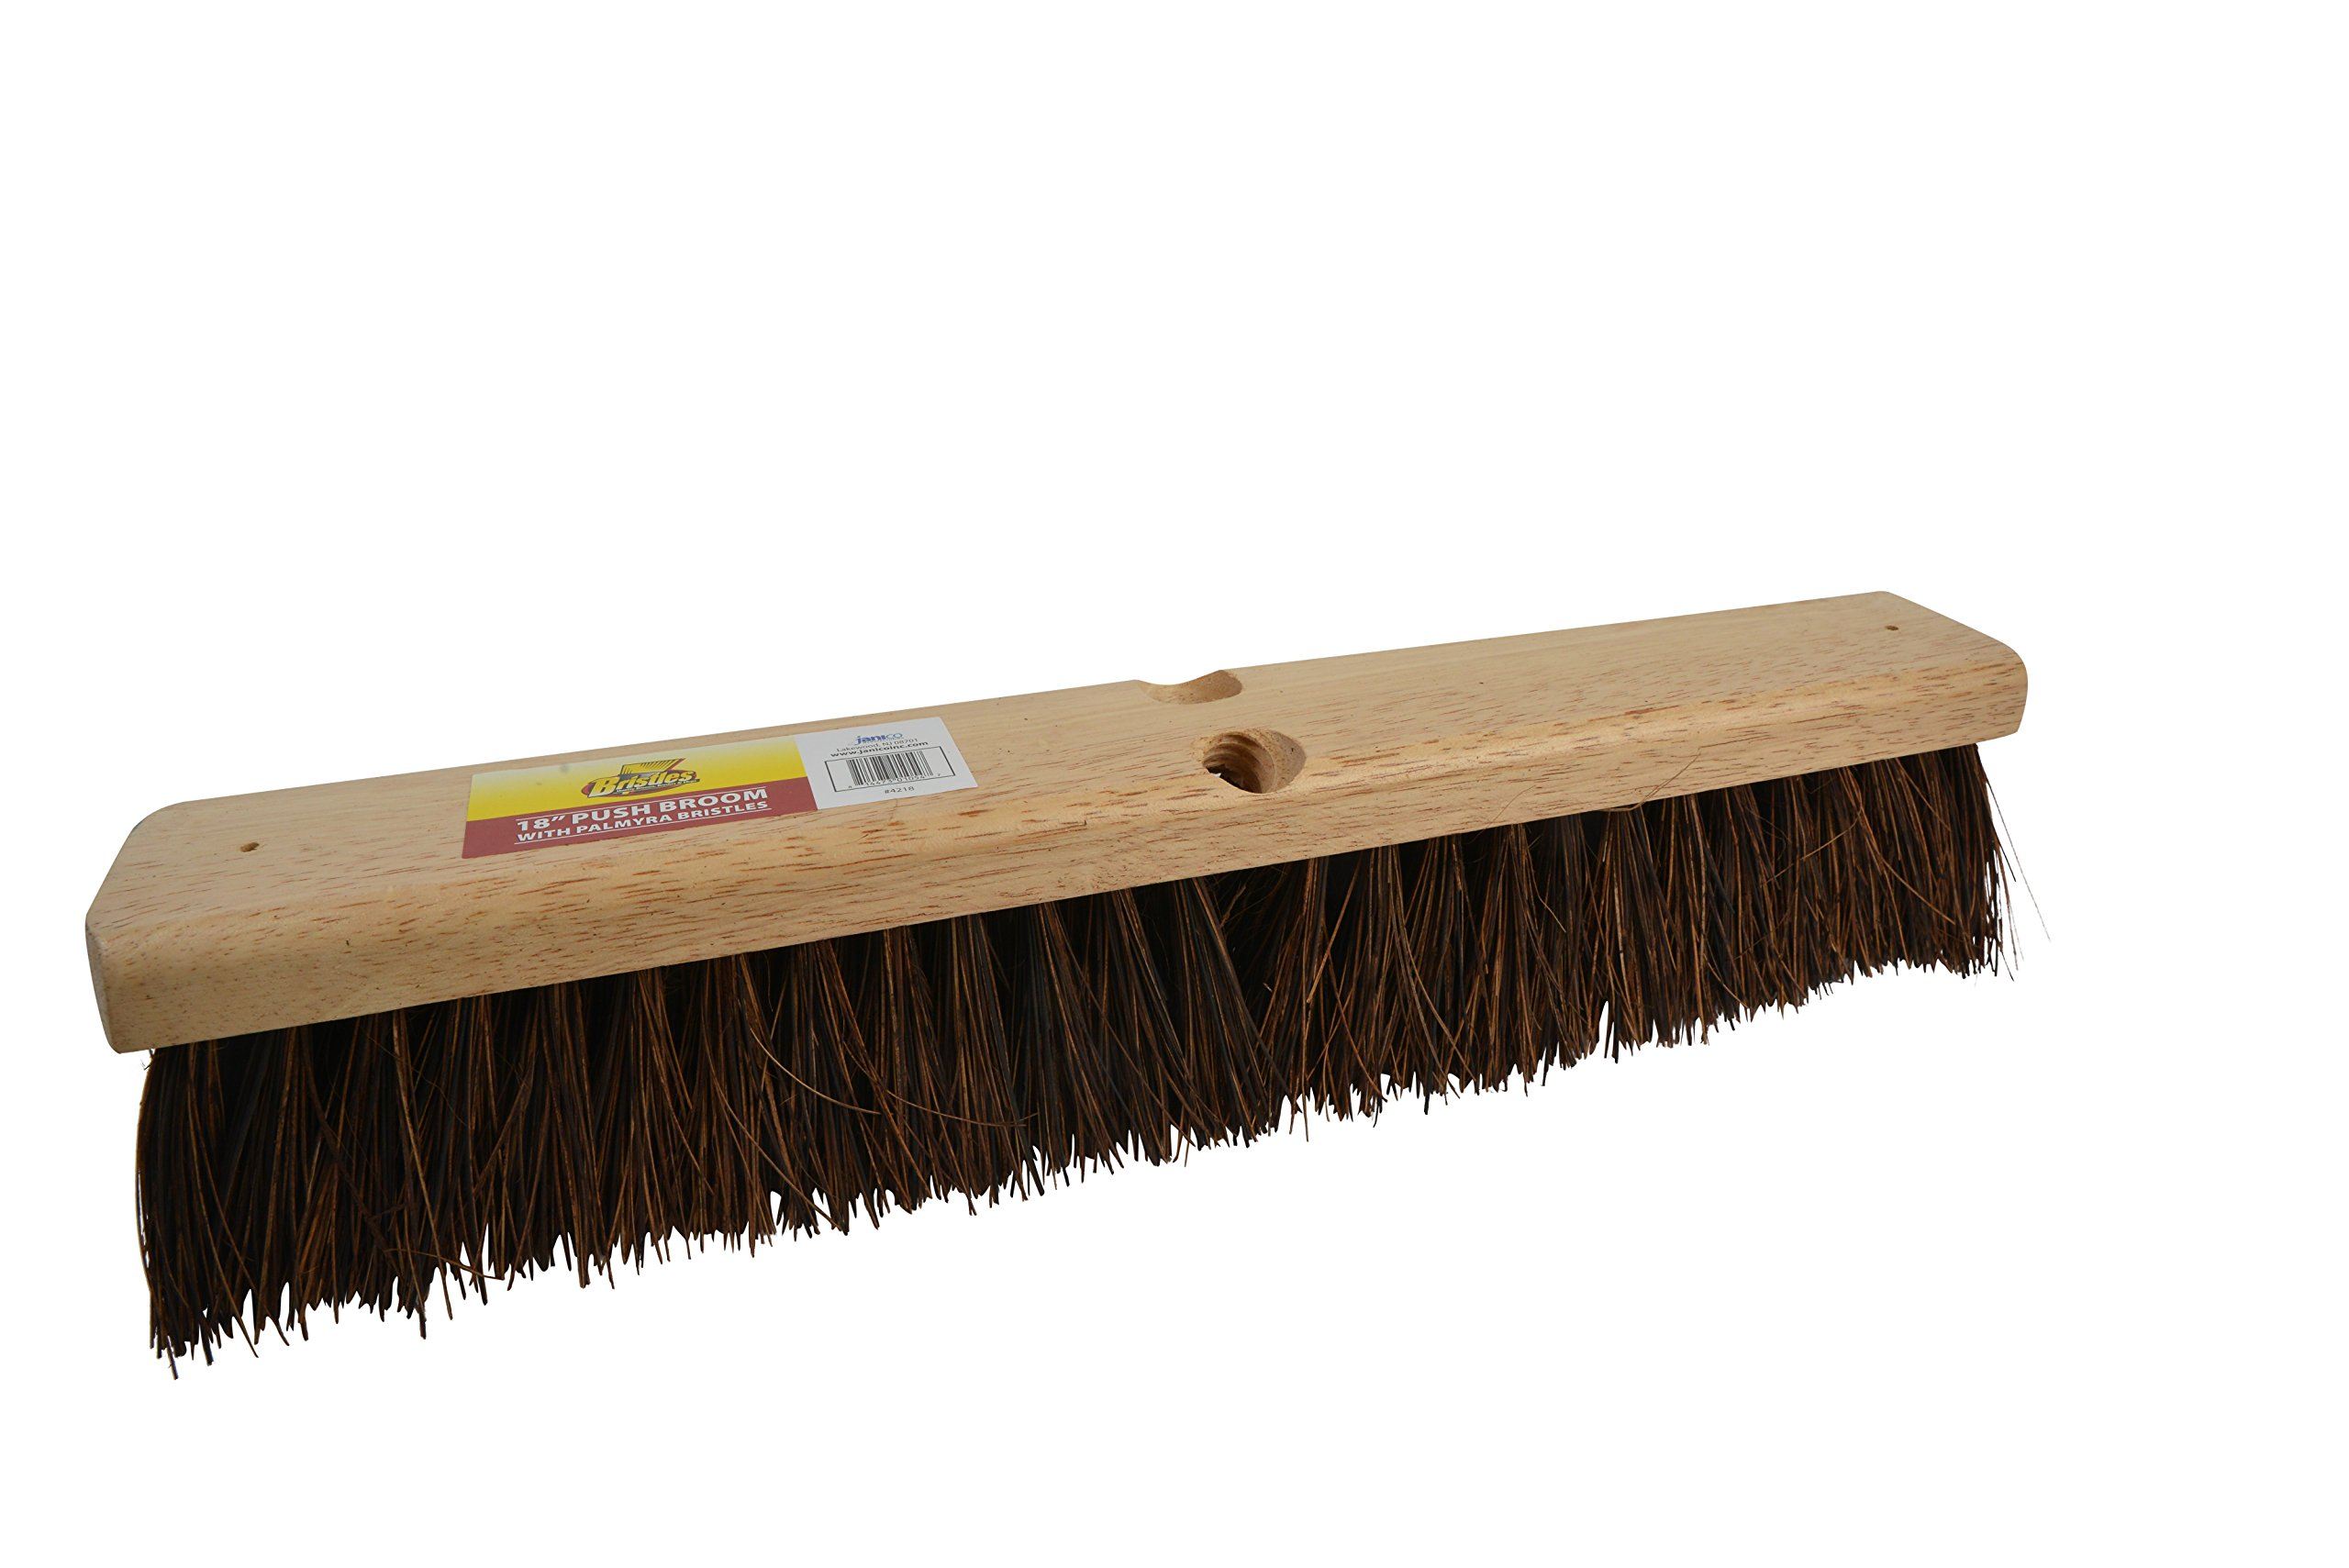 Bristles 4218 18'' Outdoor Push Broom Head - Heavy Duty Hardwood Block, Rough Surface Stiff Palmyra Fibers, Brown by Bristles